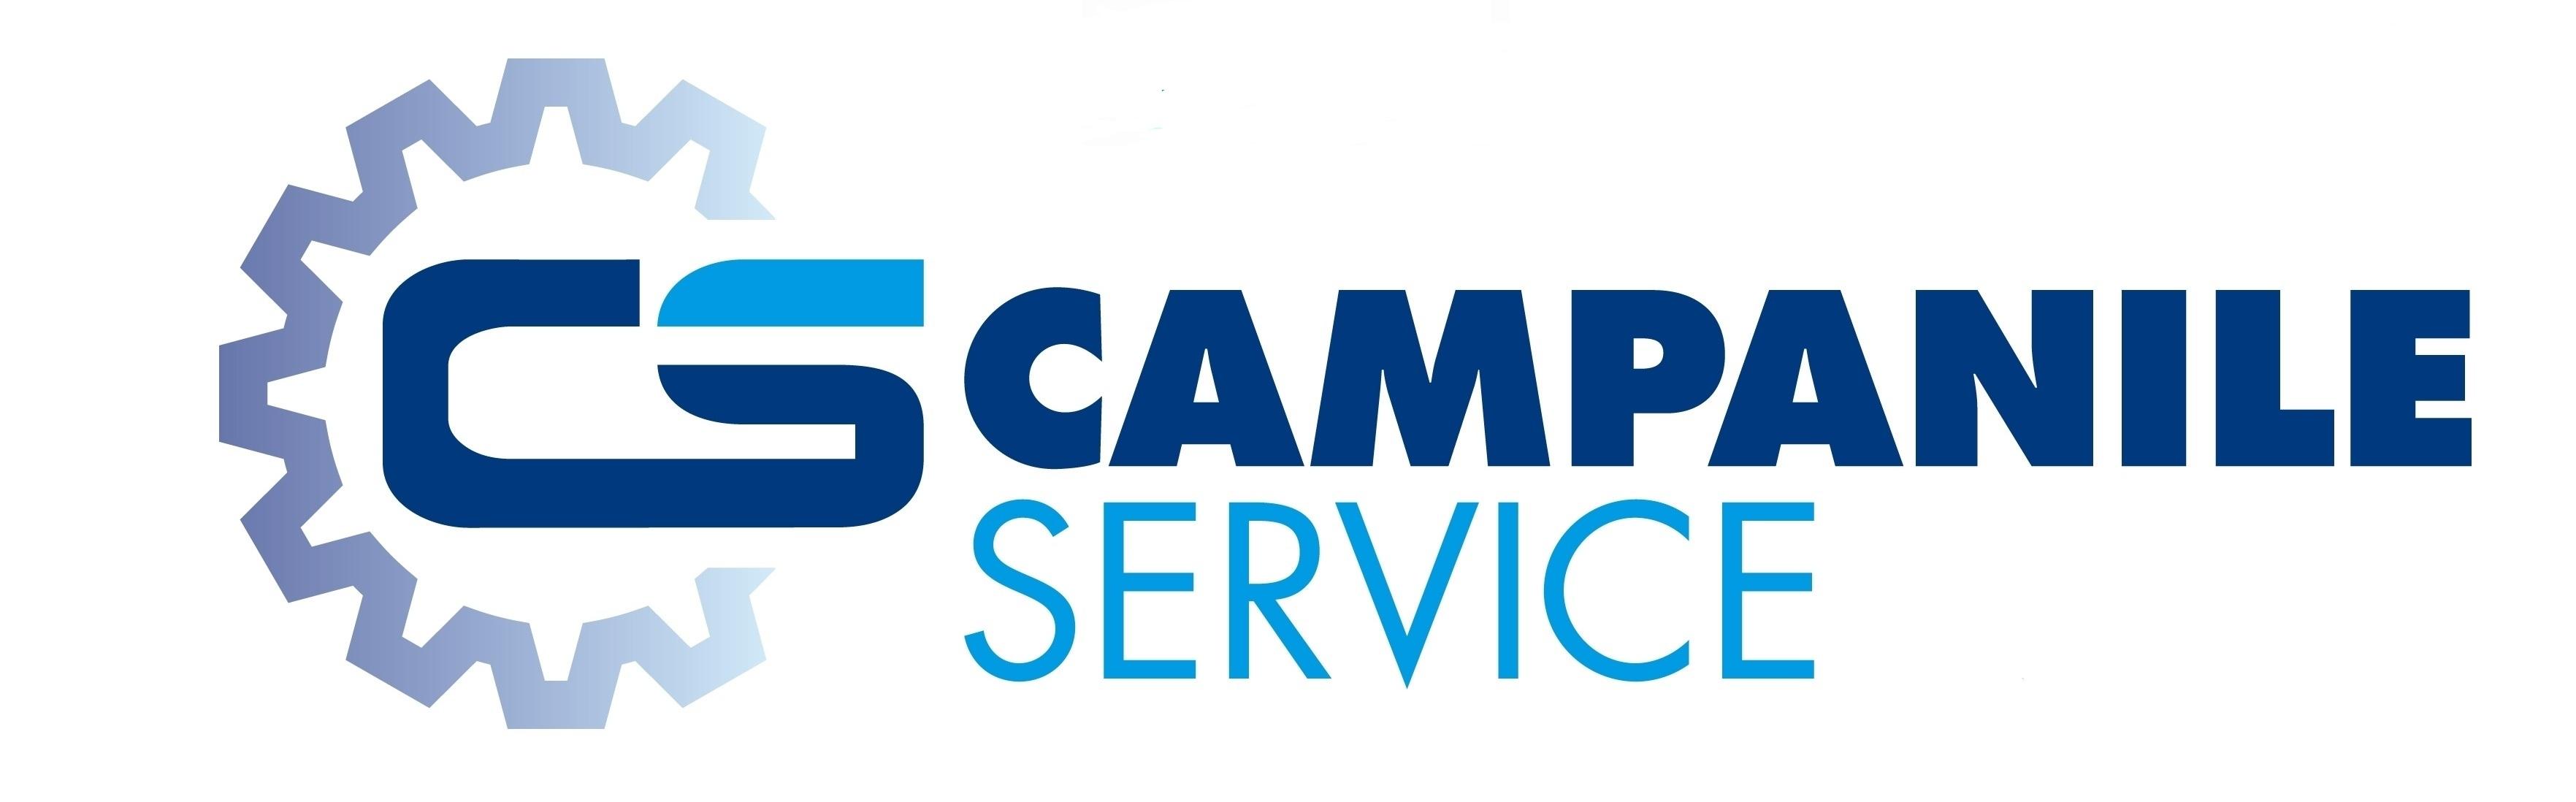 Campanile Service